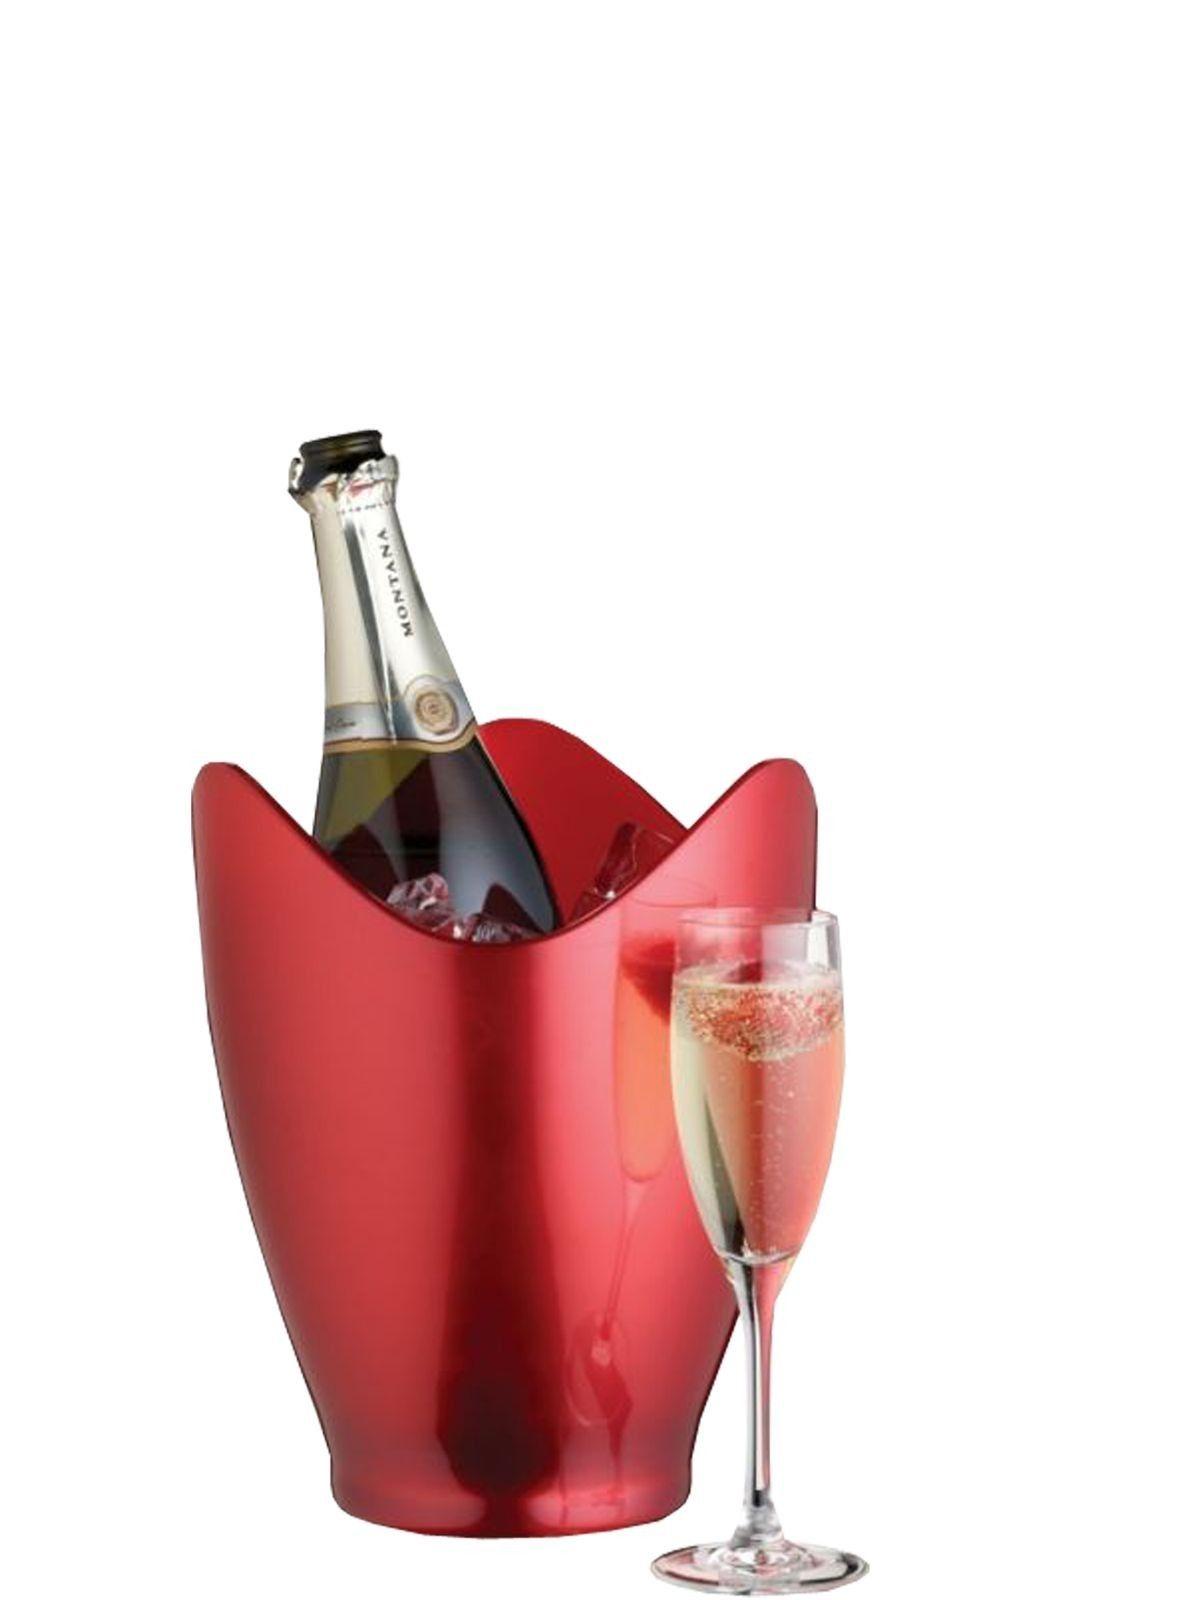 Pin By Daniela Dany On La Multi Ani In 2020 Champagne Buckets Champagne Bottles Champagne